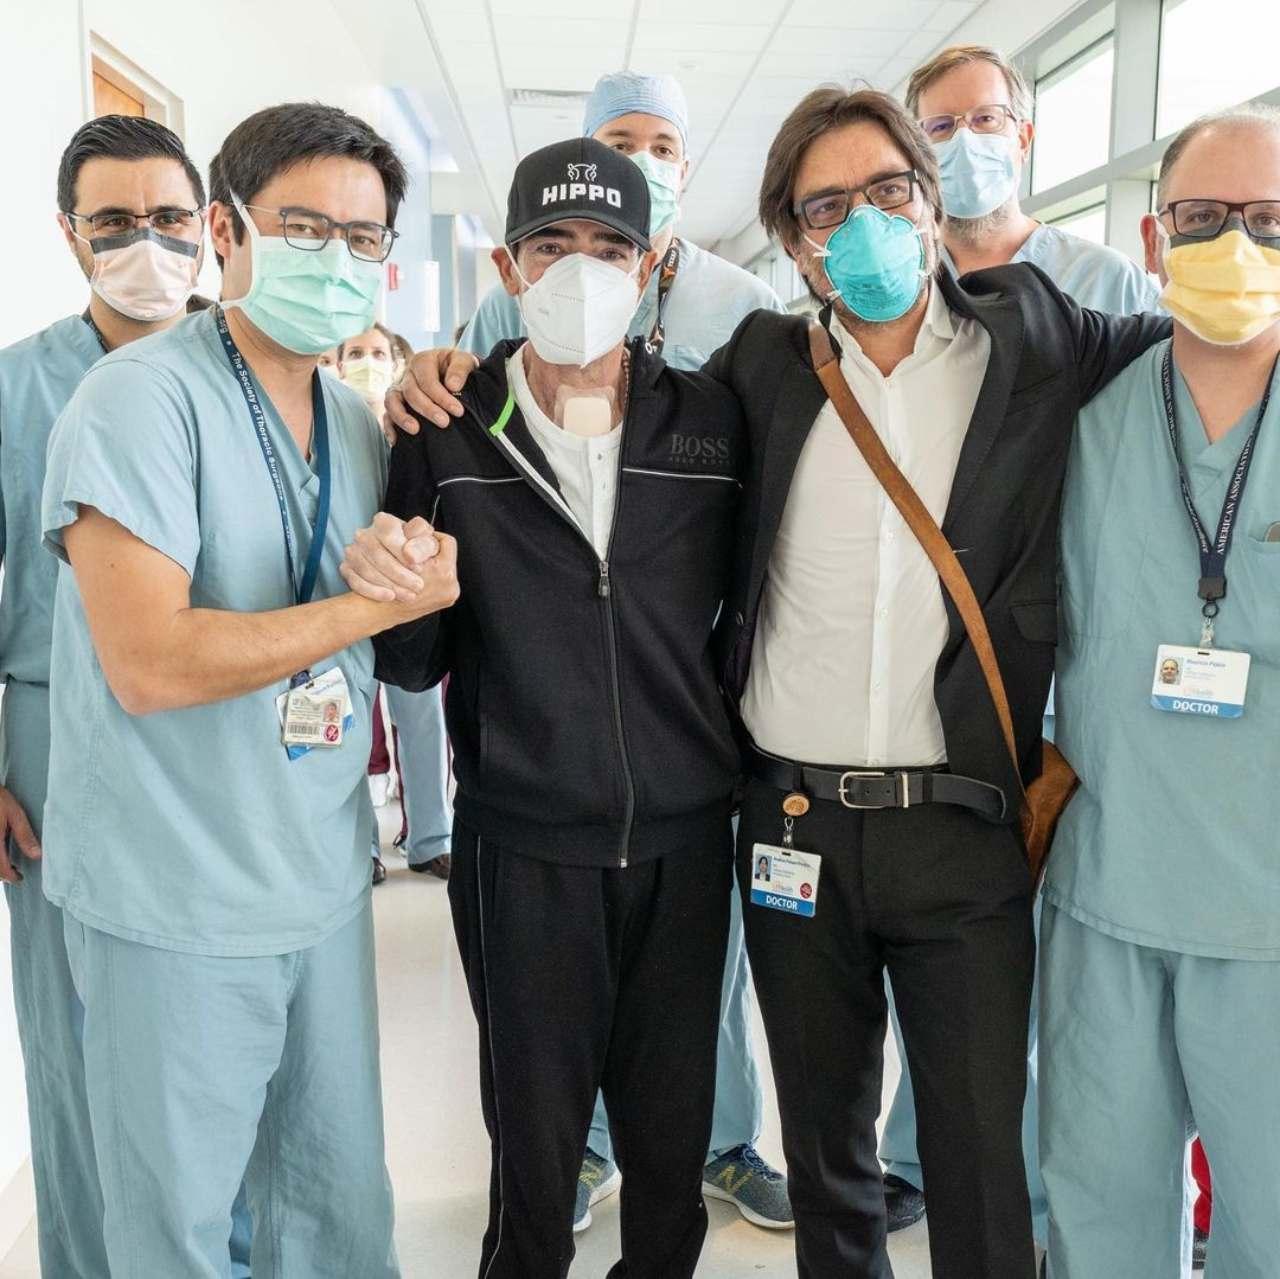 Toño Mauri sale del hospital se cae